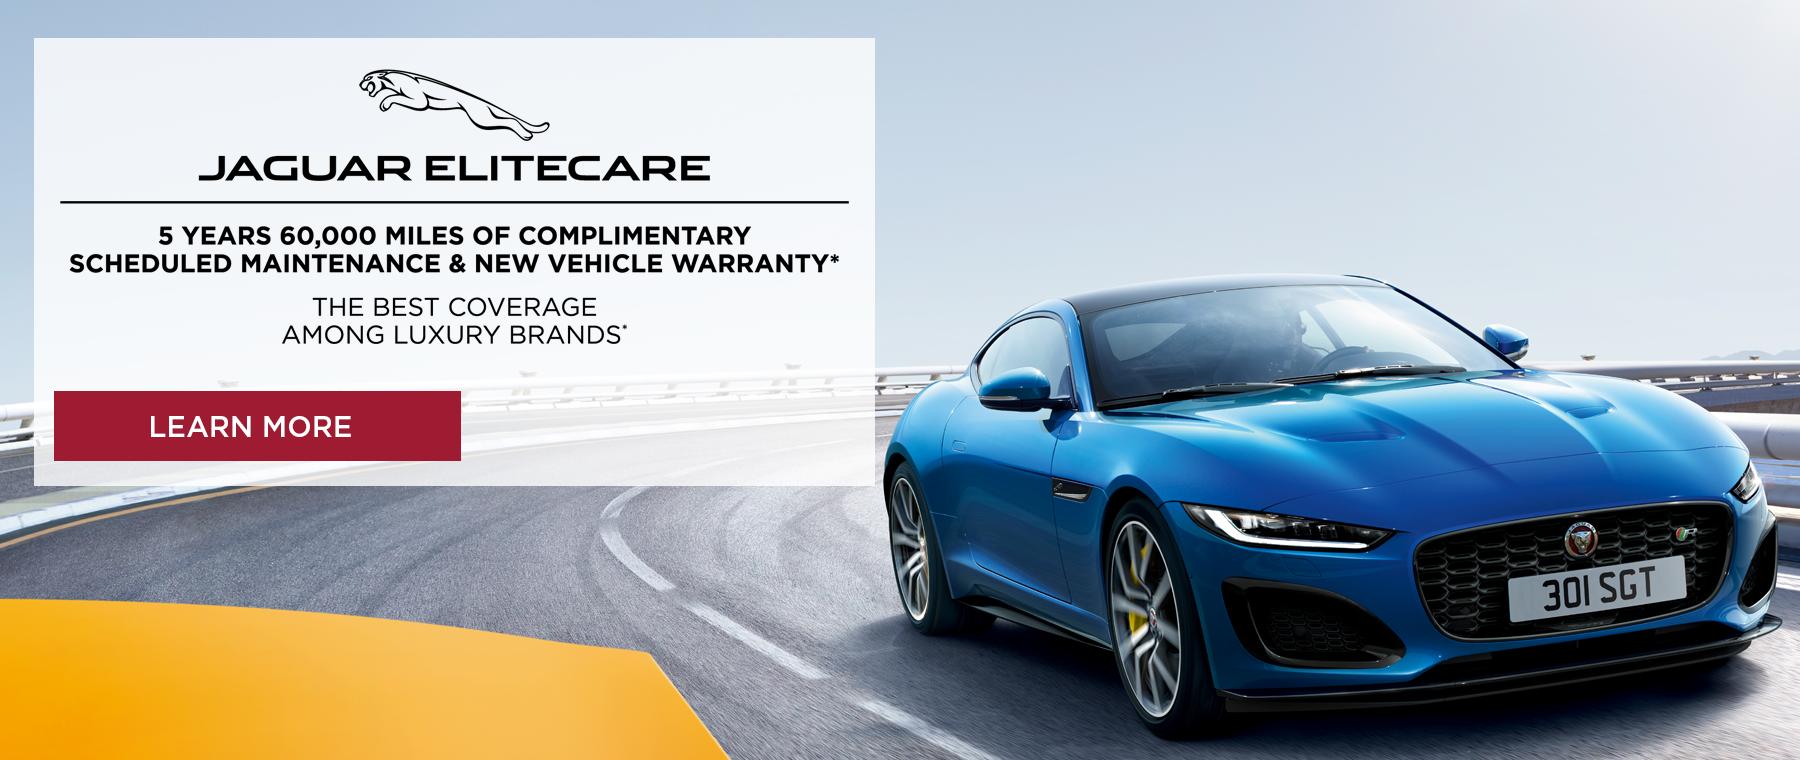 Jaguar Elitecare DI 1800×760